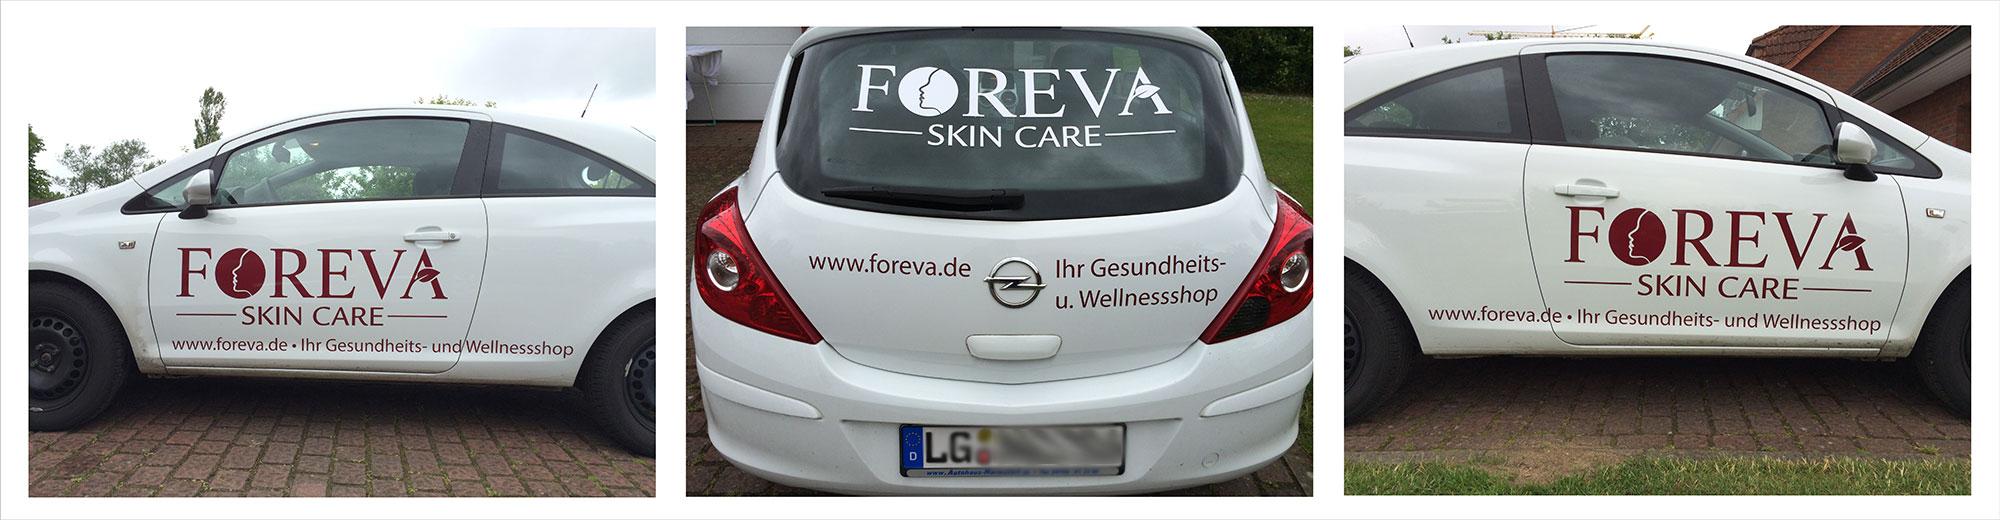 Foreva Skin Care Corsa